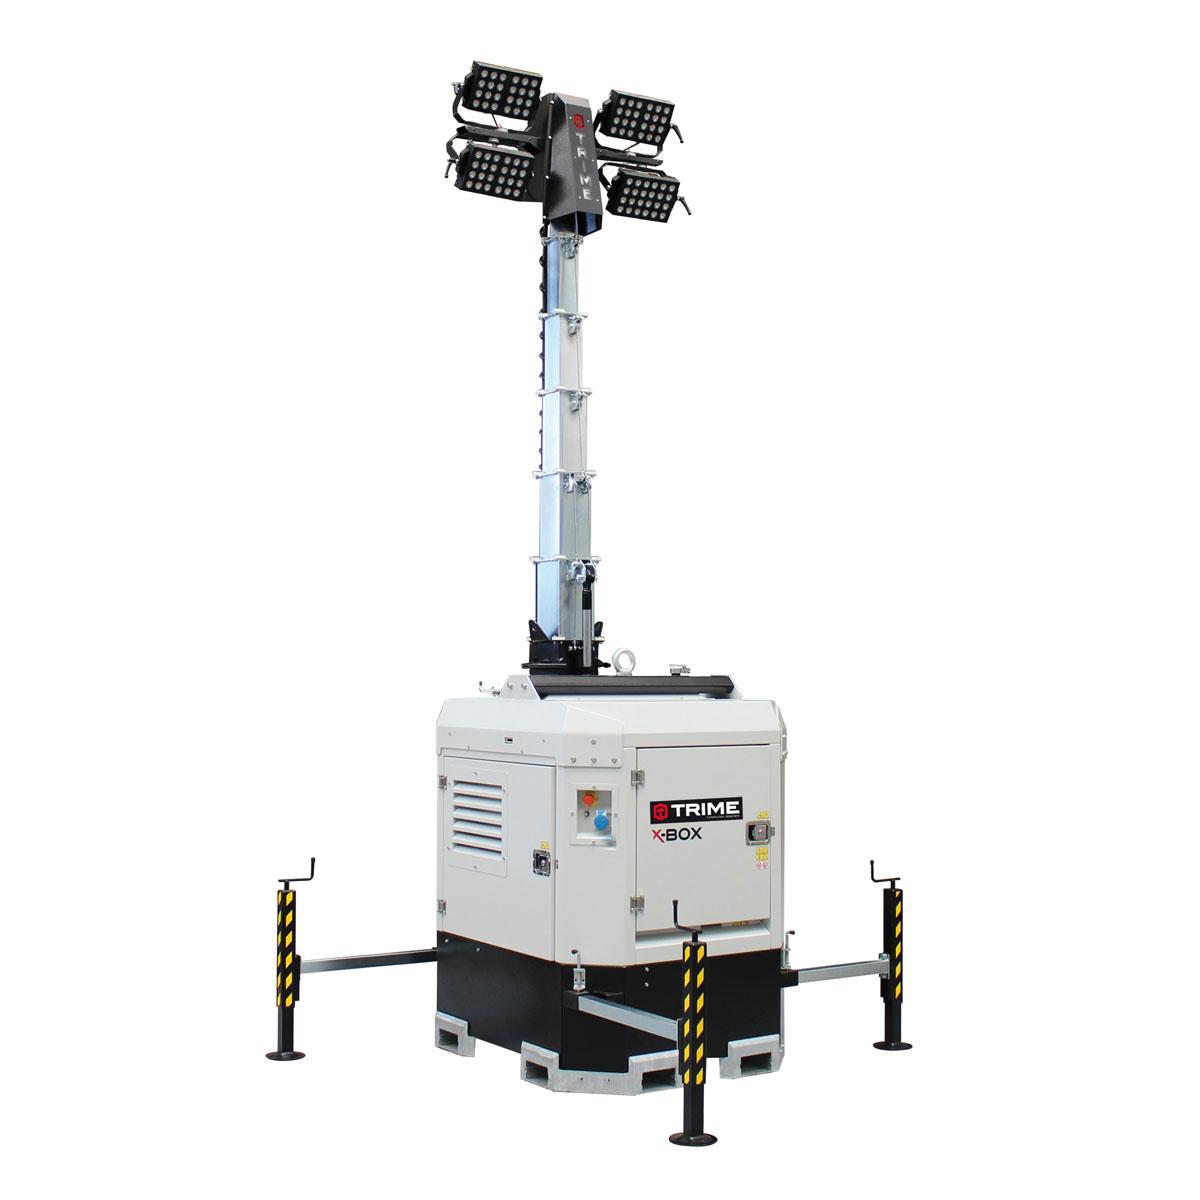 belysningsmast-led-x-box-4x300W-48V